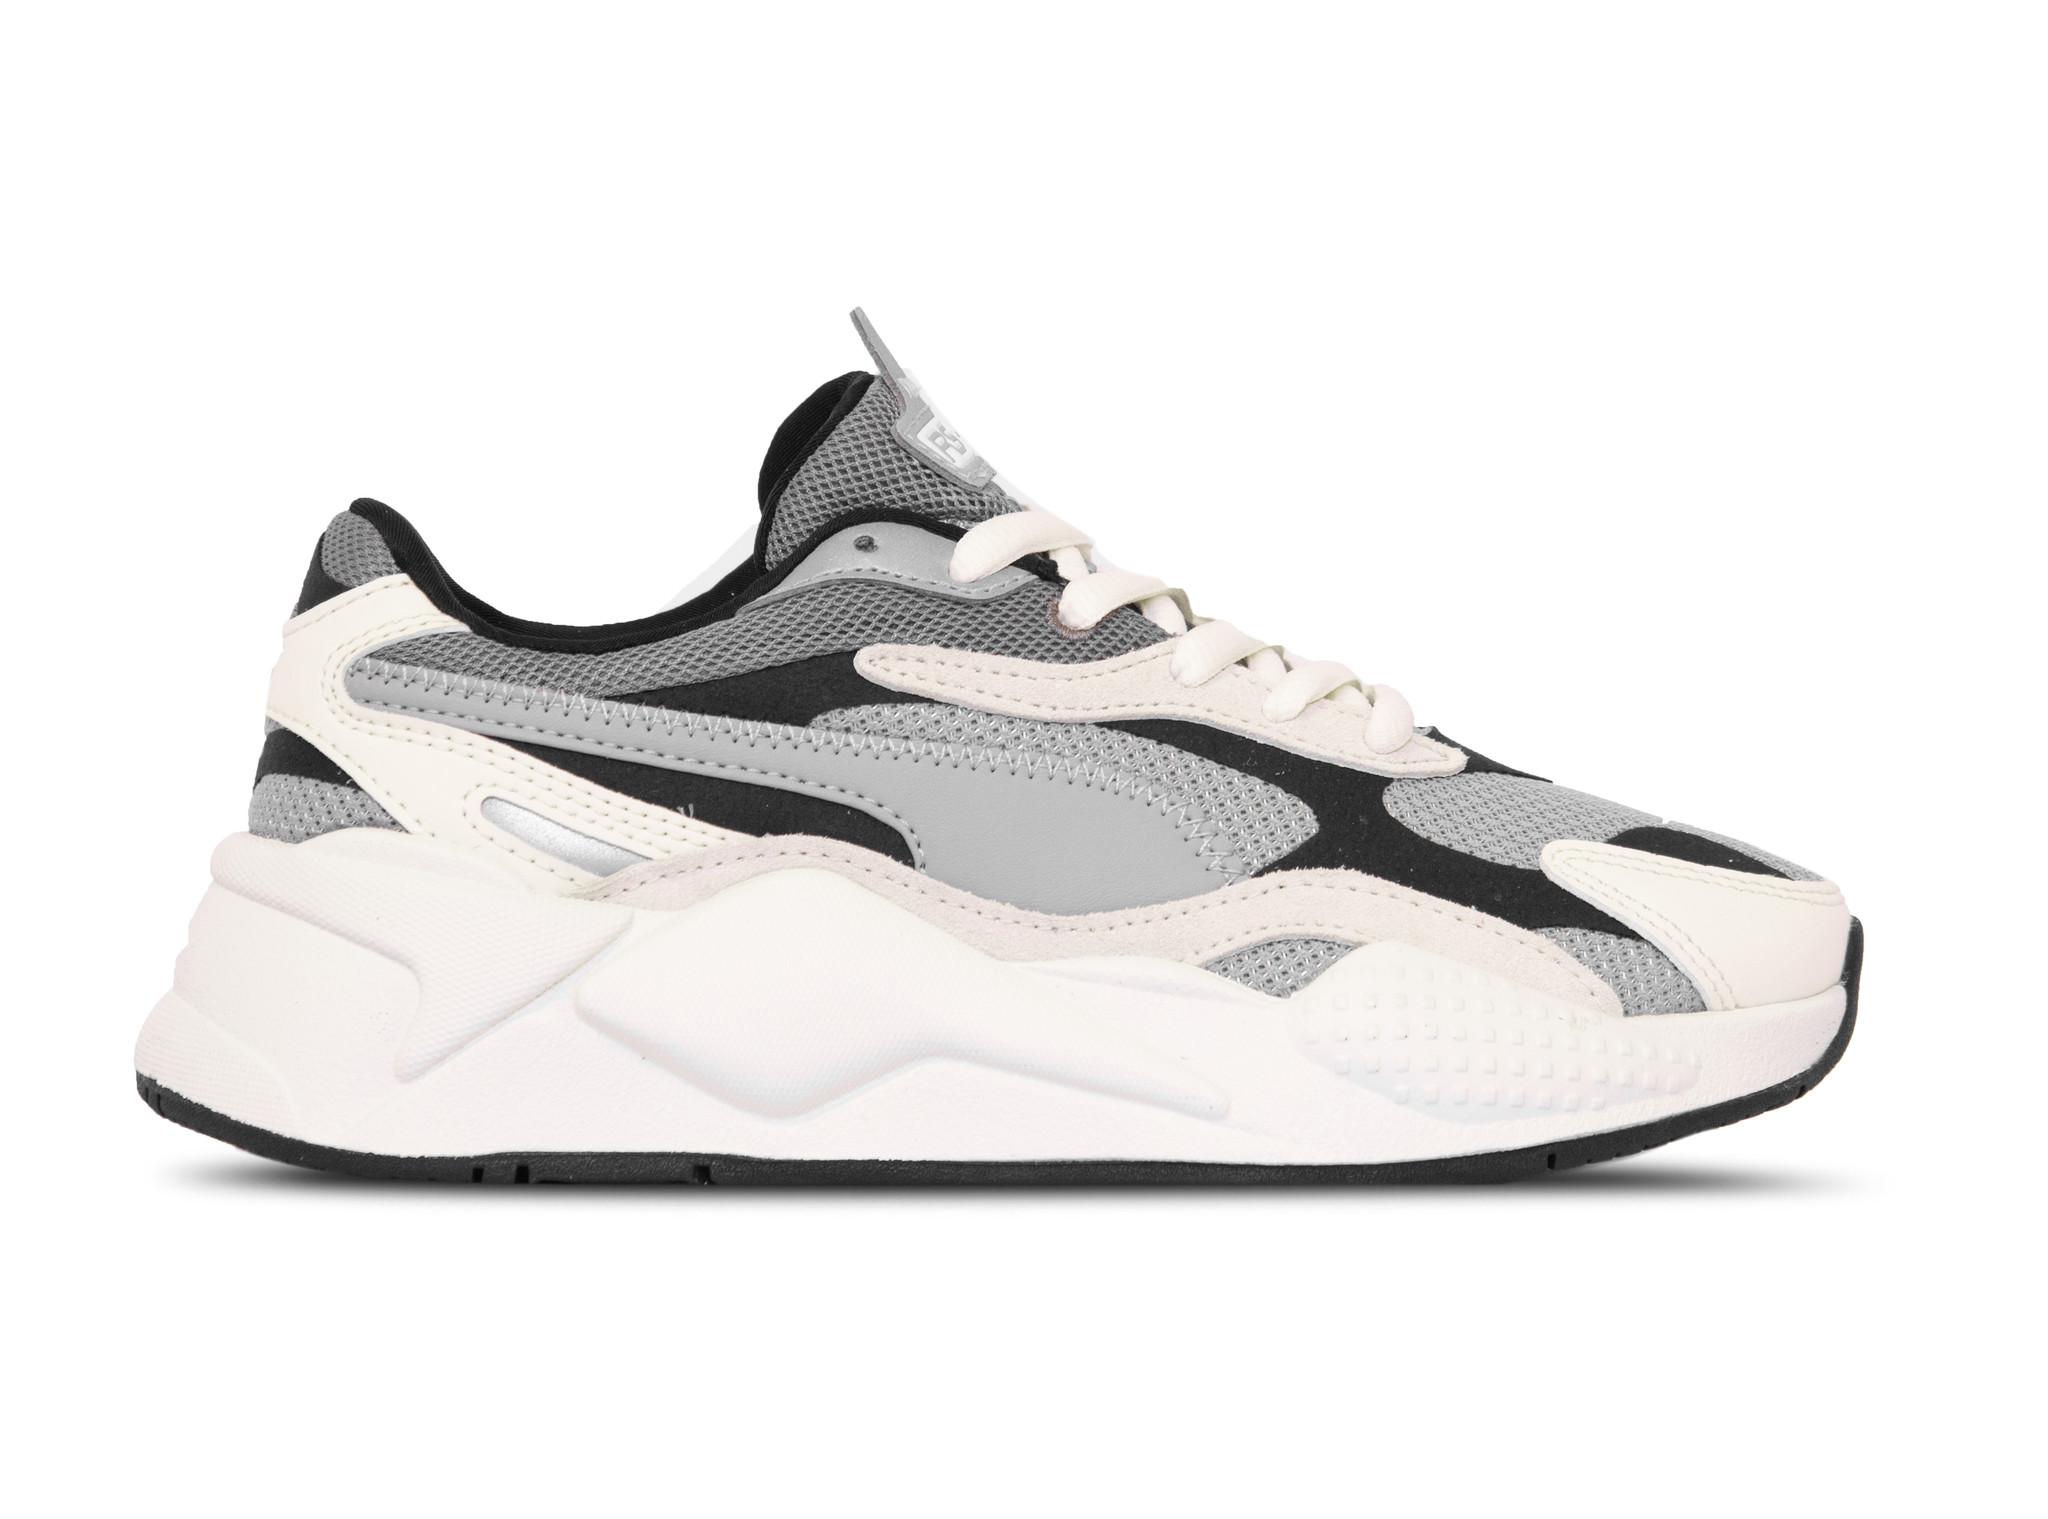 Shop Puma Puma men's shoes New Season Low Price Guarantee